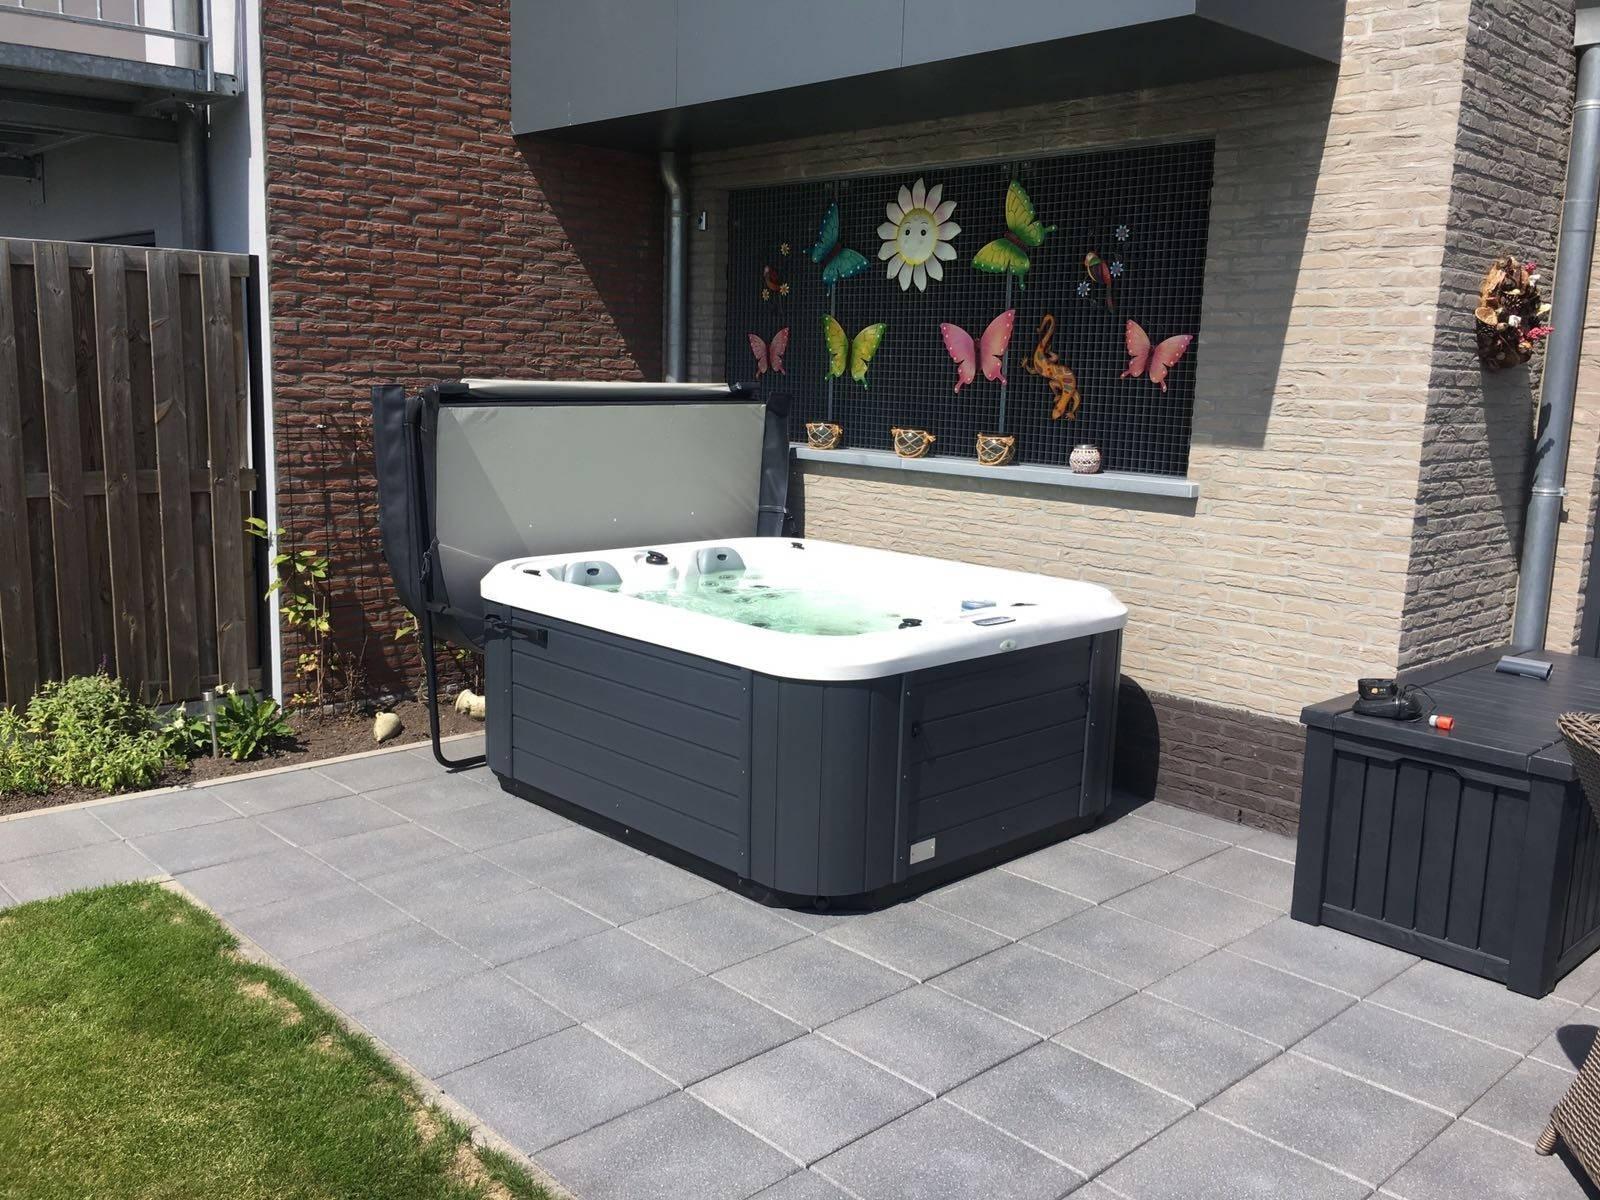 Plaatsing Allseas spa - Essen België